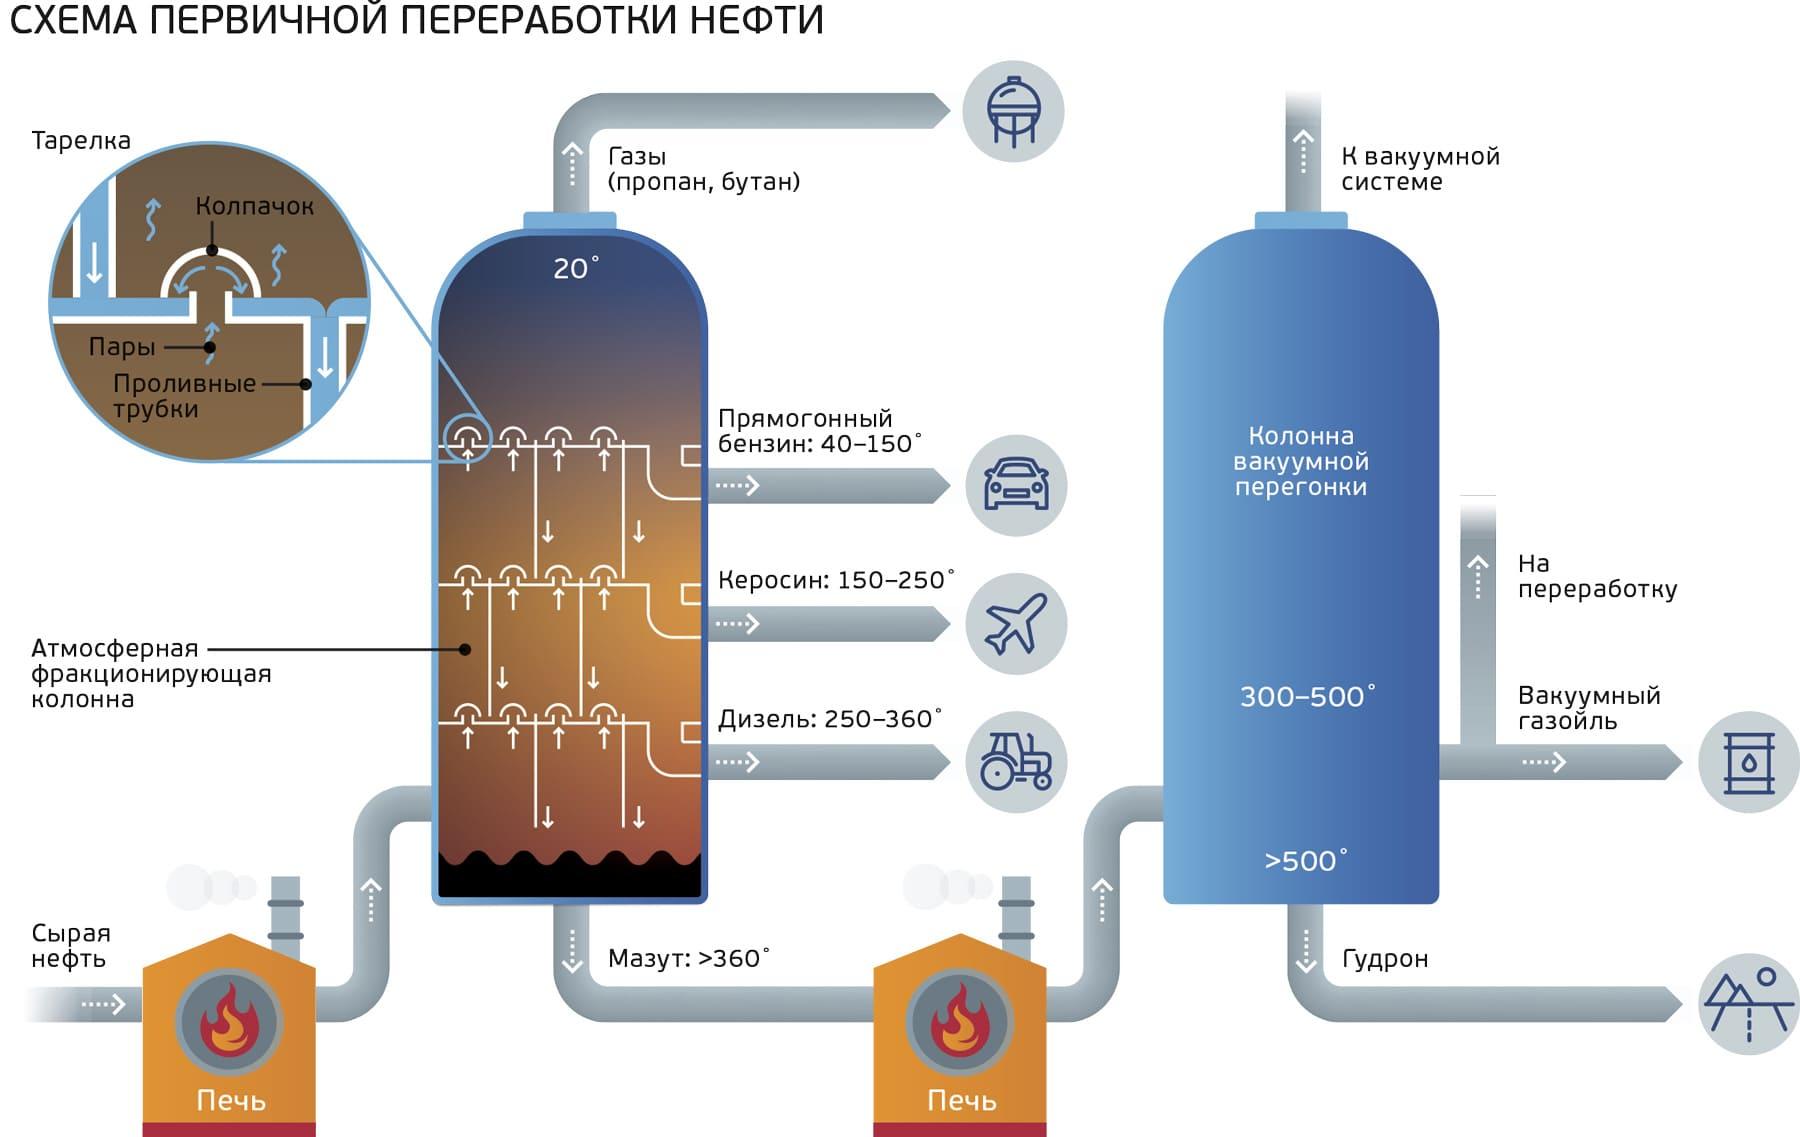 Инфографика: https://www.gazprom-neft.ru/press-center/sibneft-online/archive/2016-may-projects/1113436/